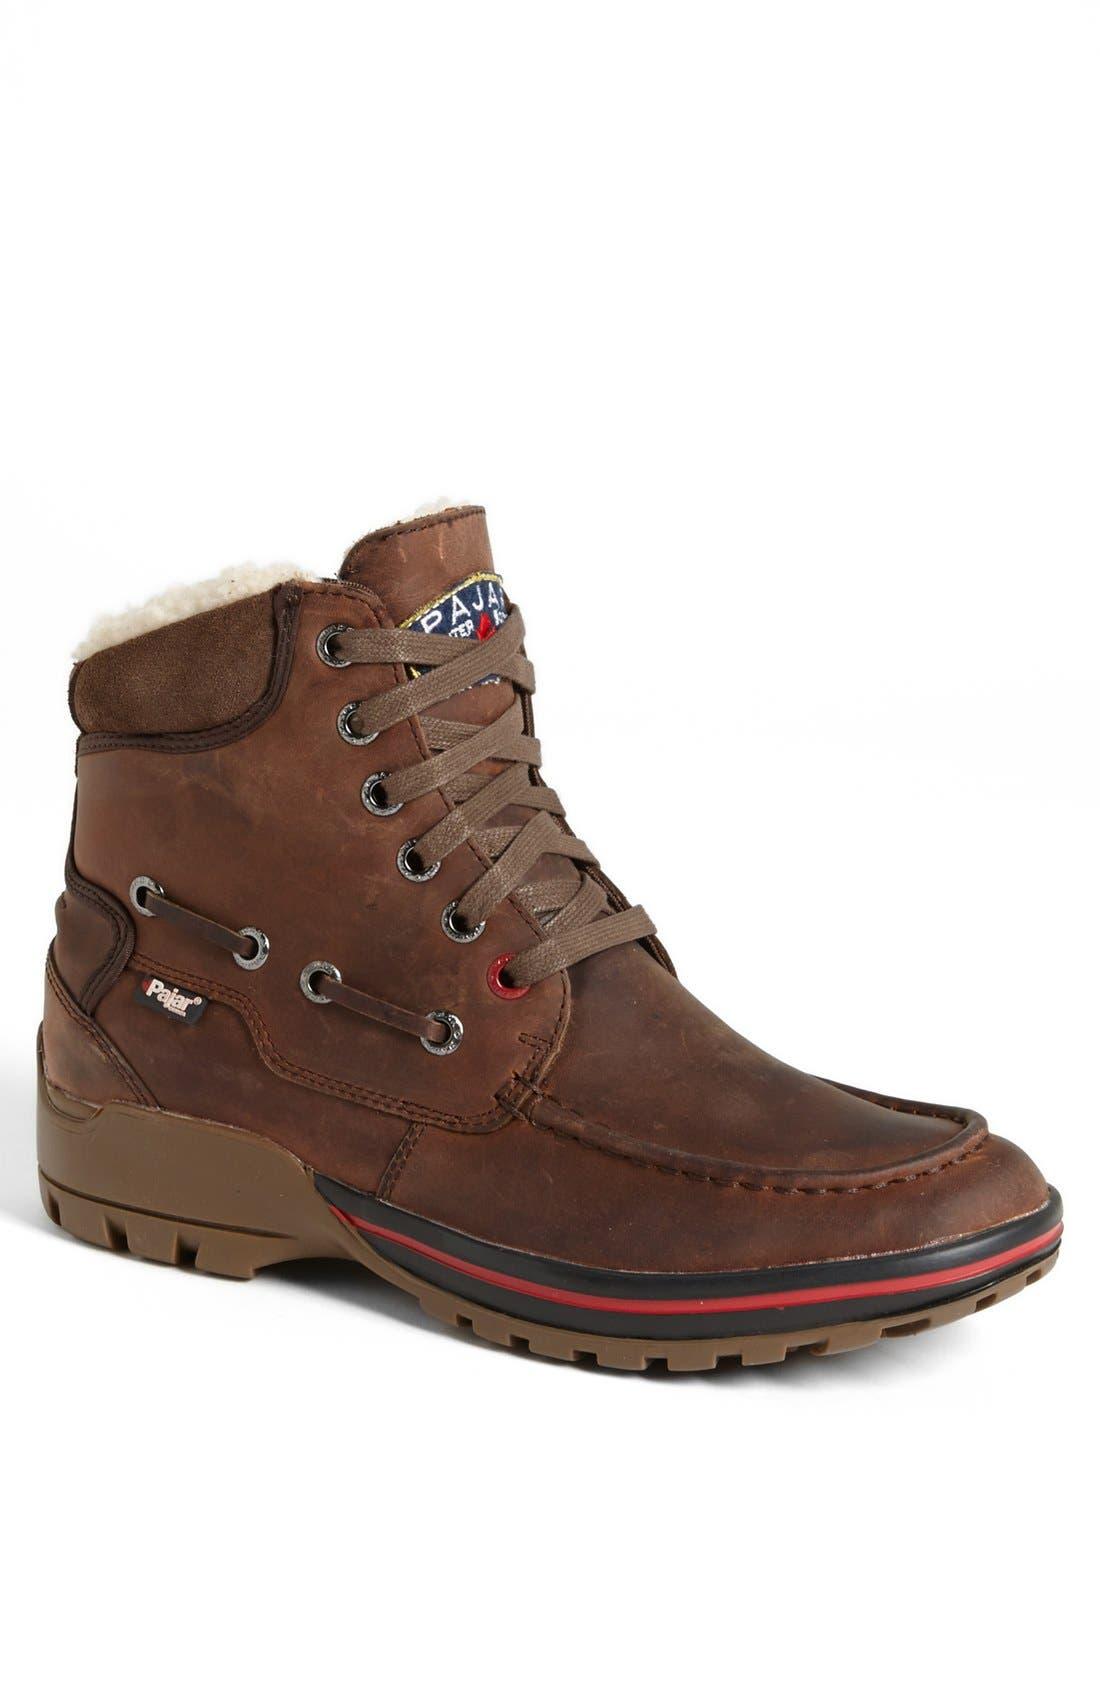 Alternate Image 1 Selected - Pajar 'Basel' Snow Boot